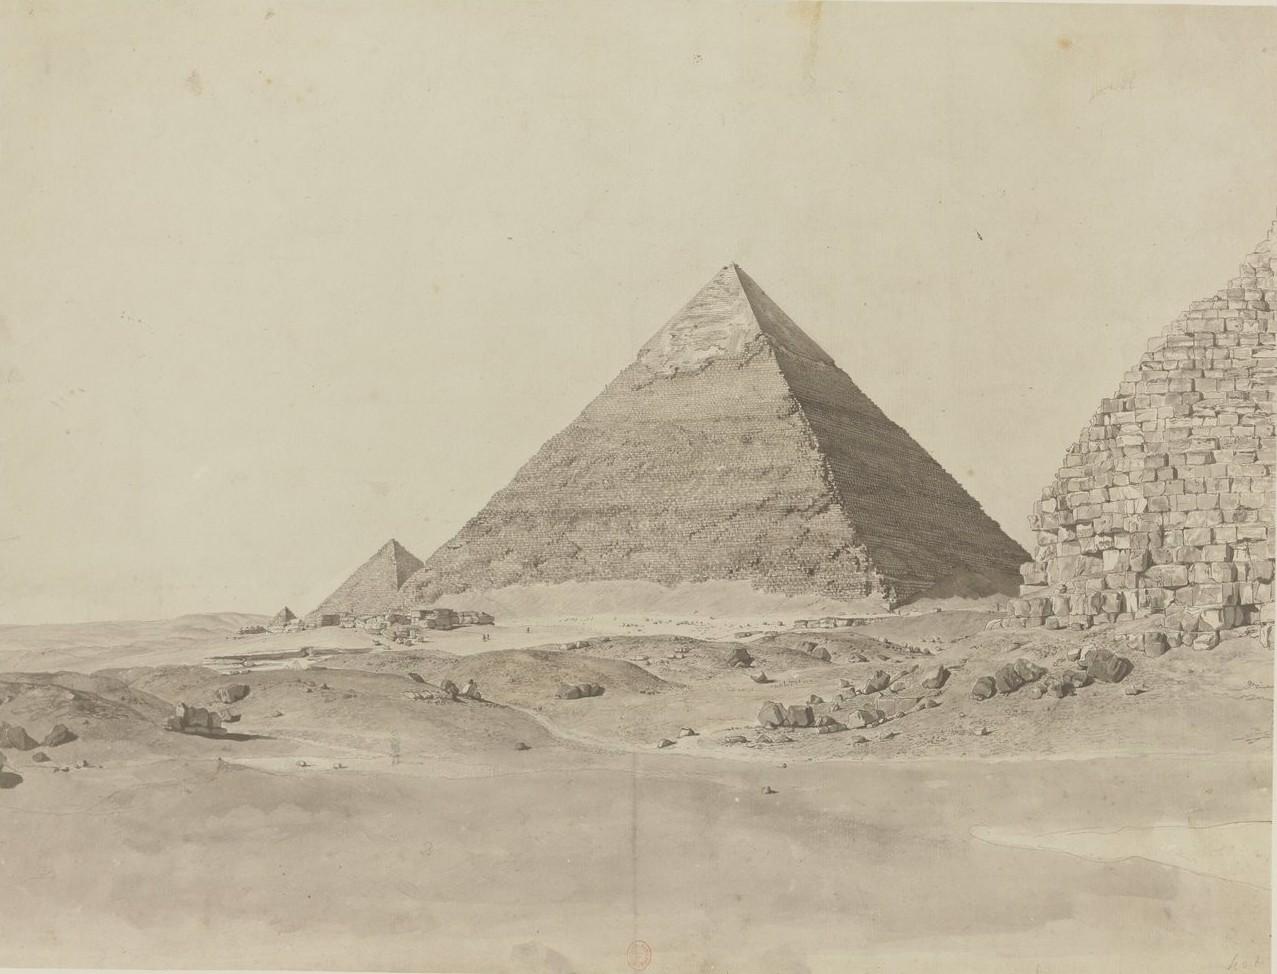 Пирамиды Гизы. Пирамида Хефрена. Вид с востока